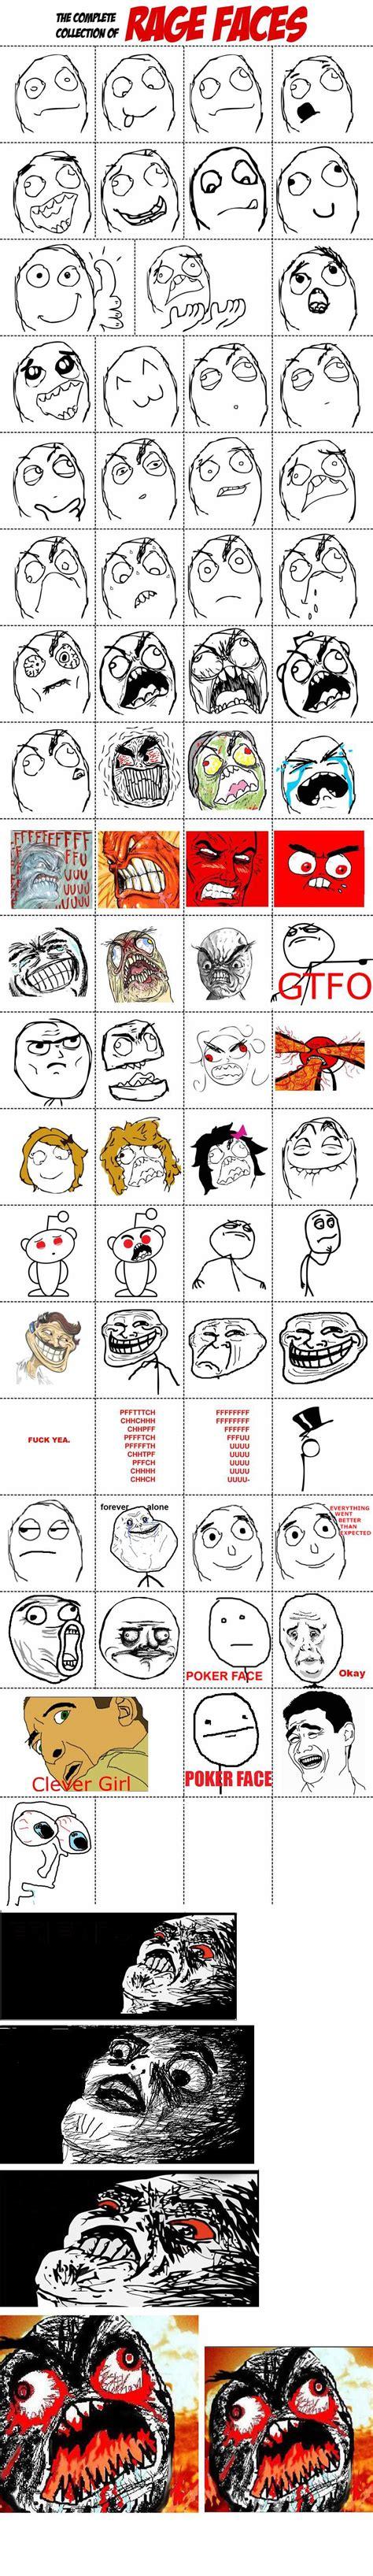 Rage Meme Faces - rage meme faces list www imgkid com the image kid has it